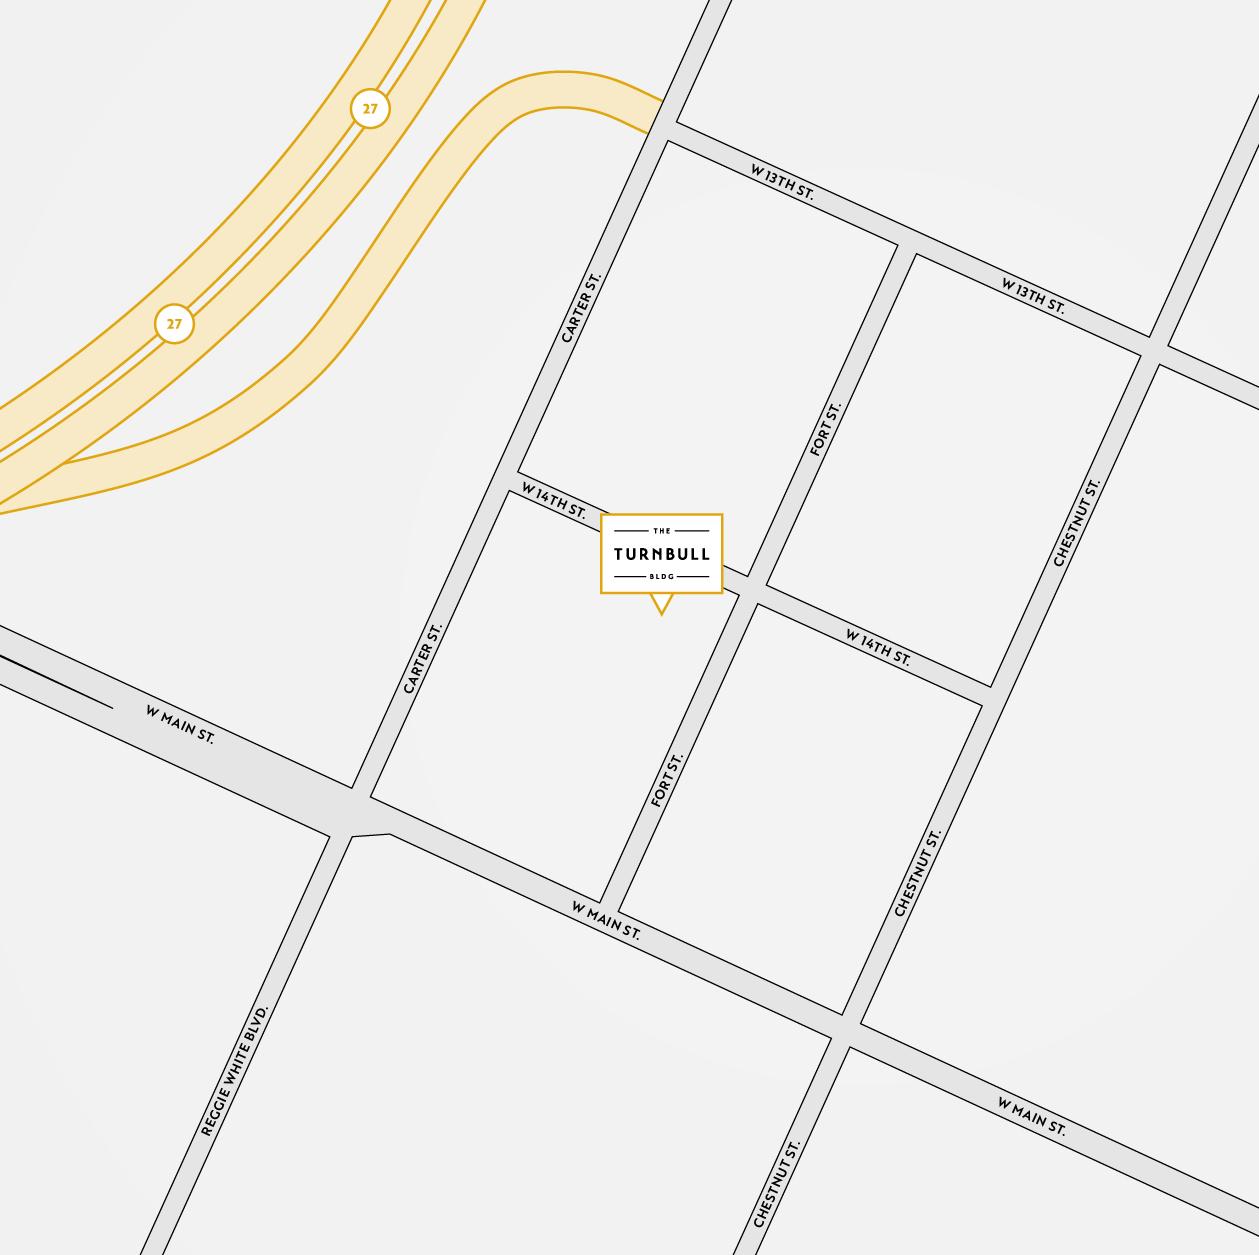 Turnbull+Map-01.jpg